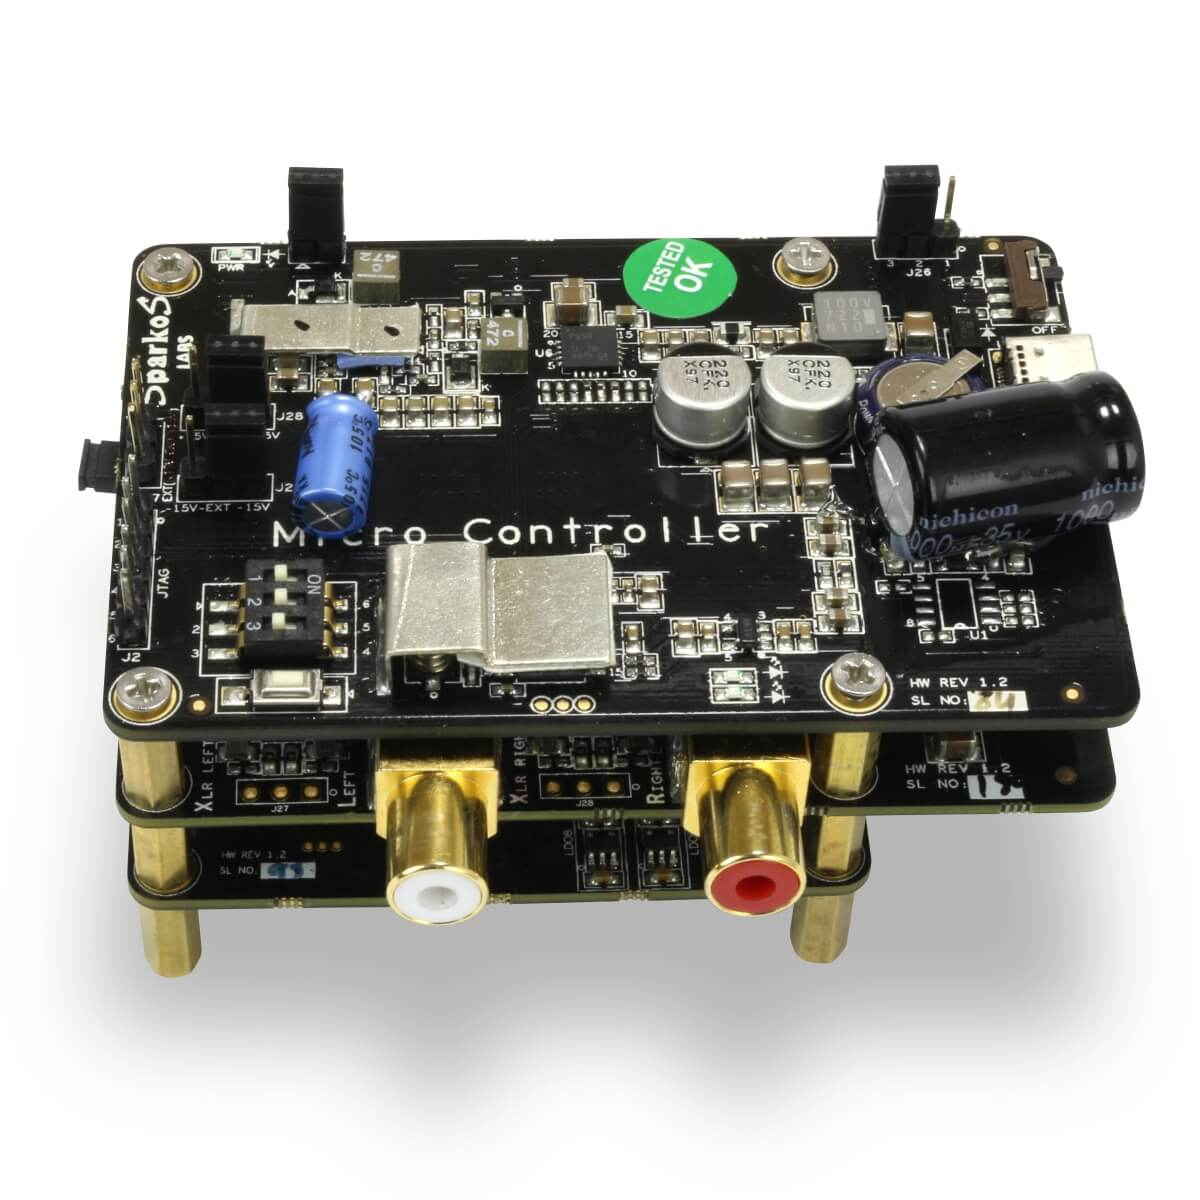 ALLO KATANA 1.2 SOUND QUALITY DAC pour Raspberry Pi ES9038Q2M 6x AOP SparkoS Labs SS3601 32bit 384kHz DSD128